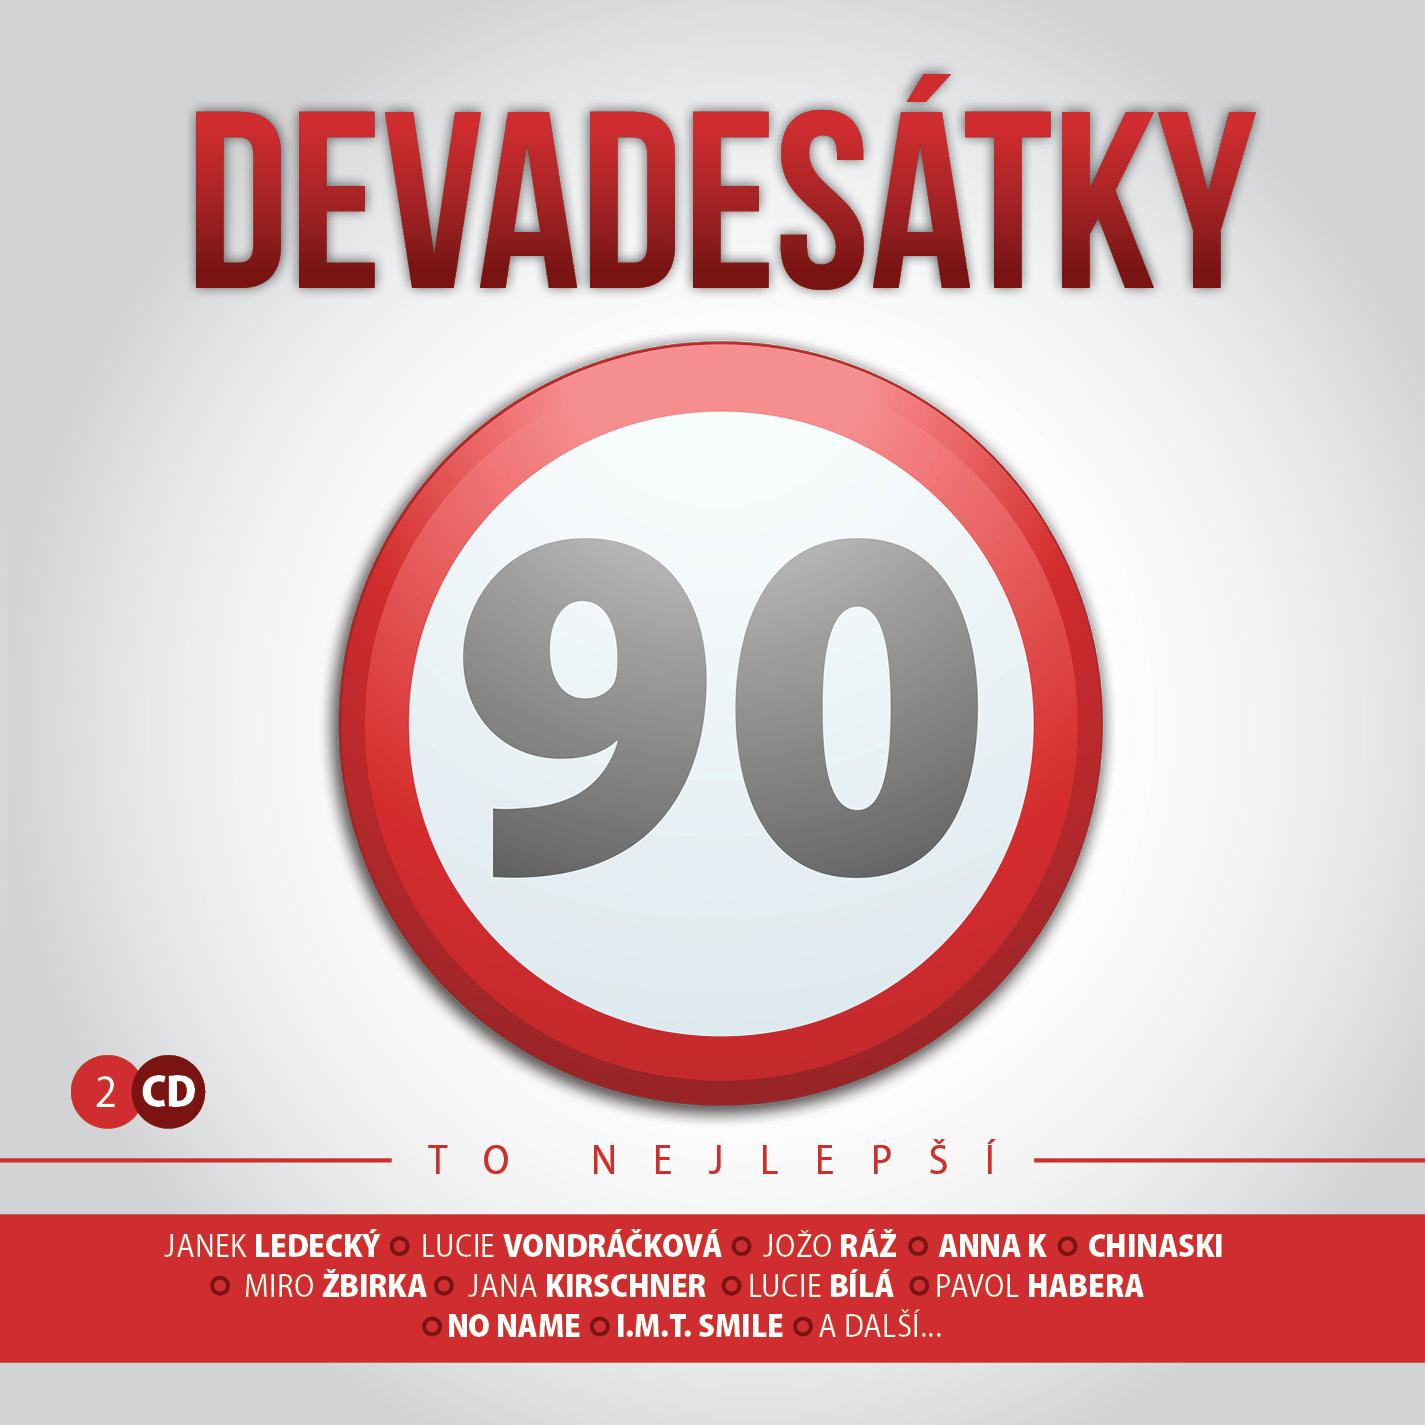 CD Shop - RUZNI/POP NATIONAL DEVADESATKY - TO NEJLEPSI